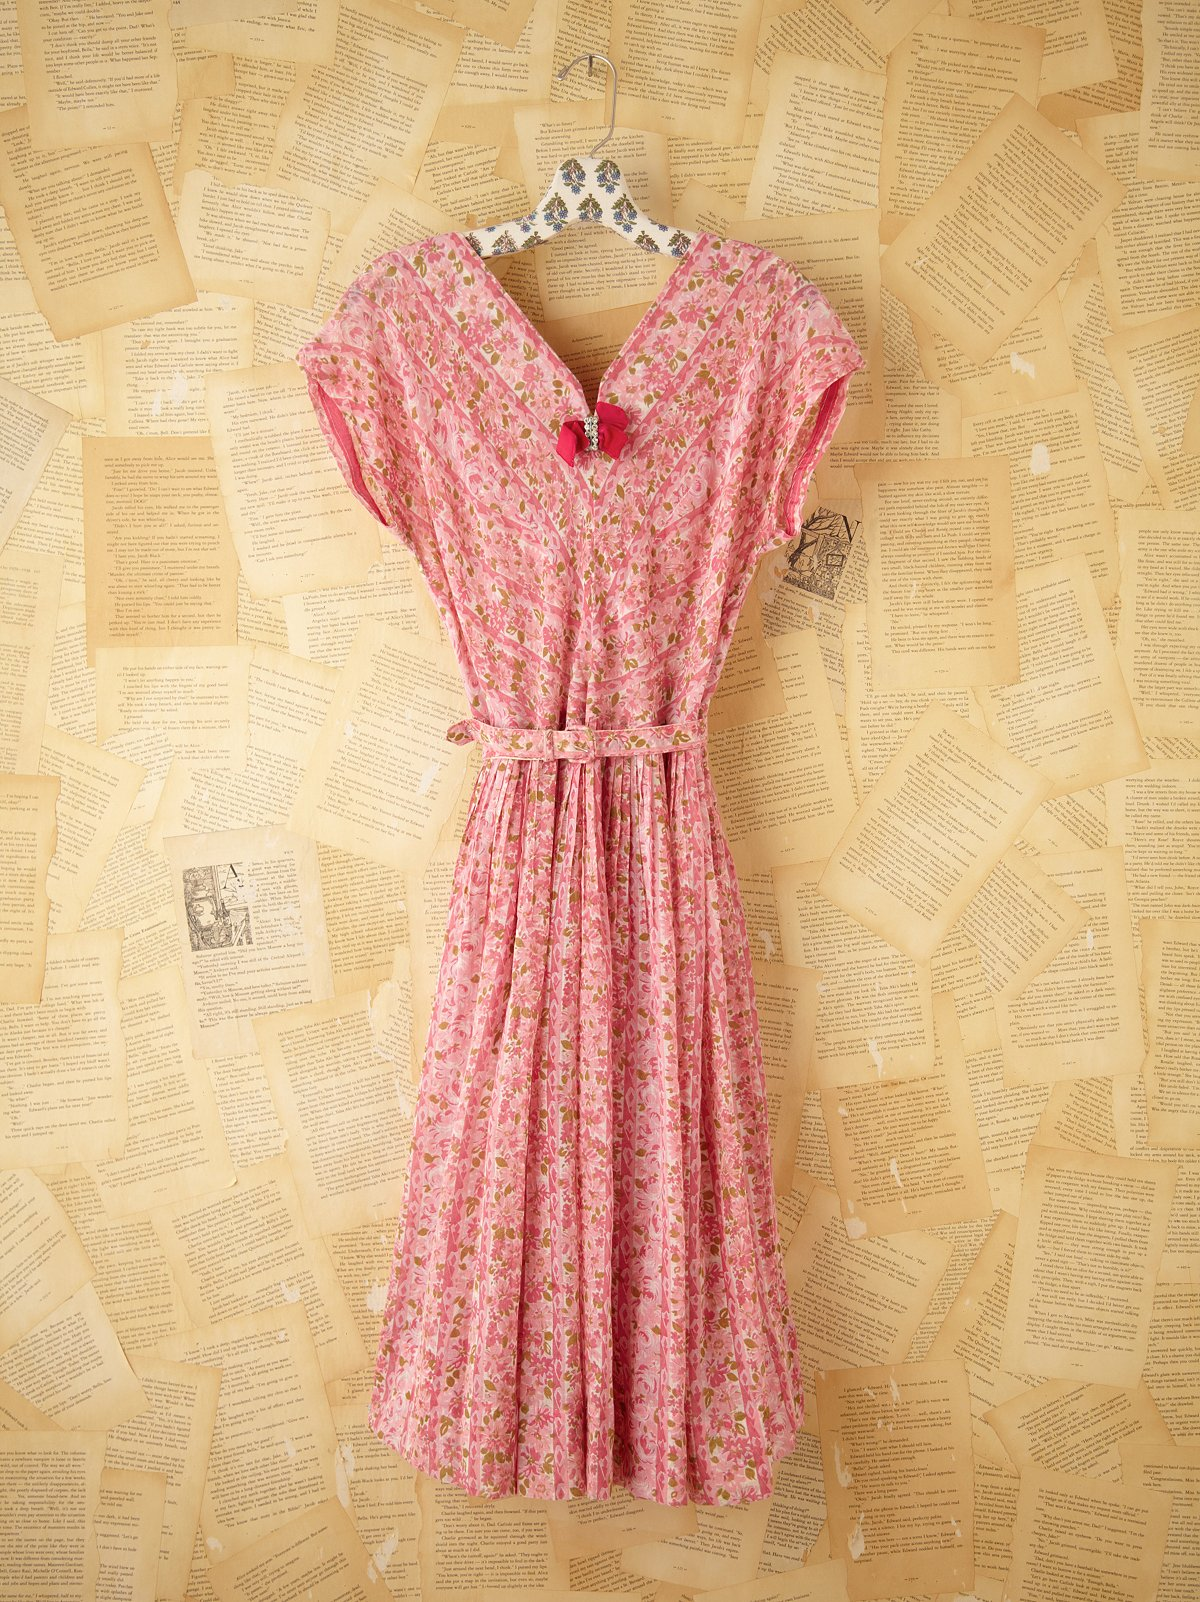 Vintage 1950s Print Dress